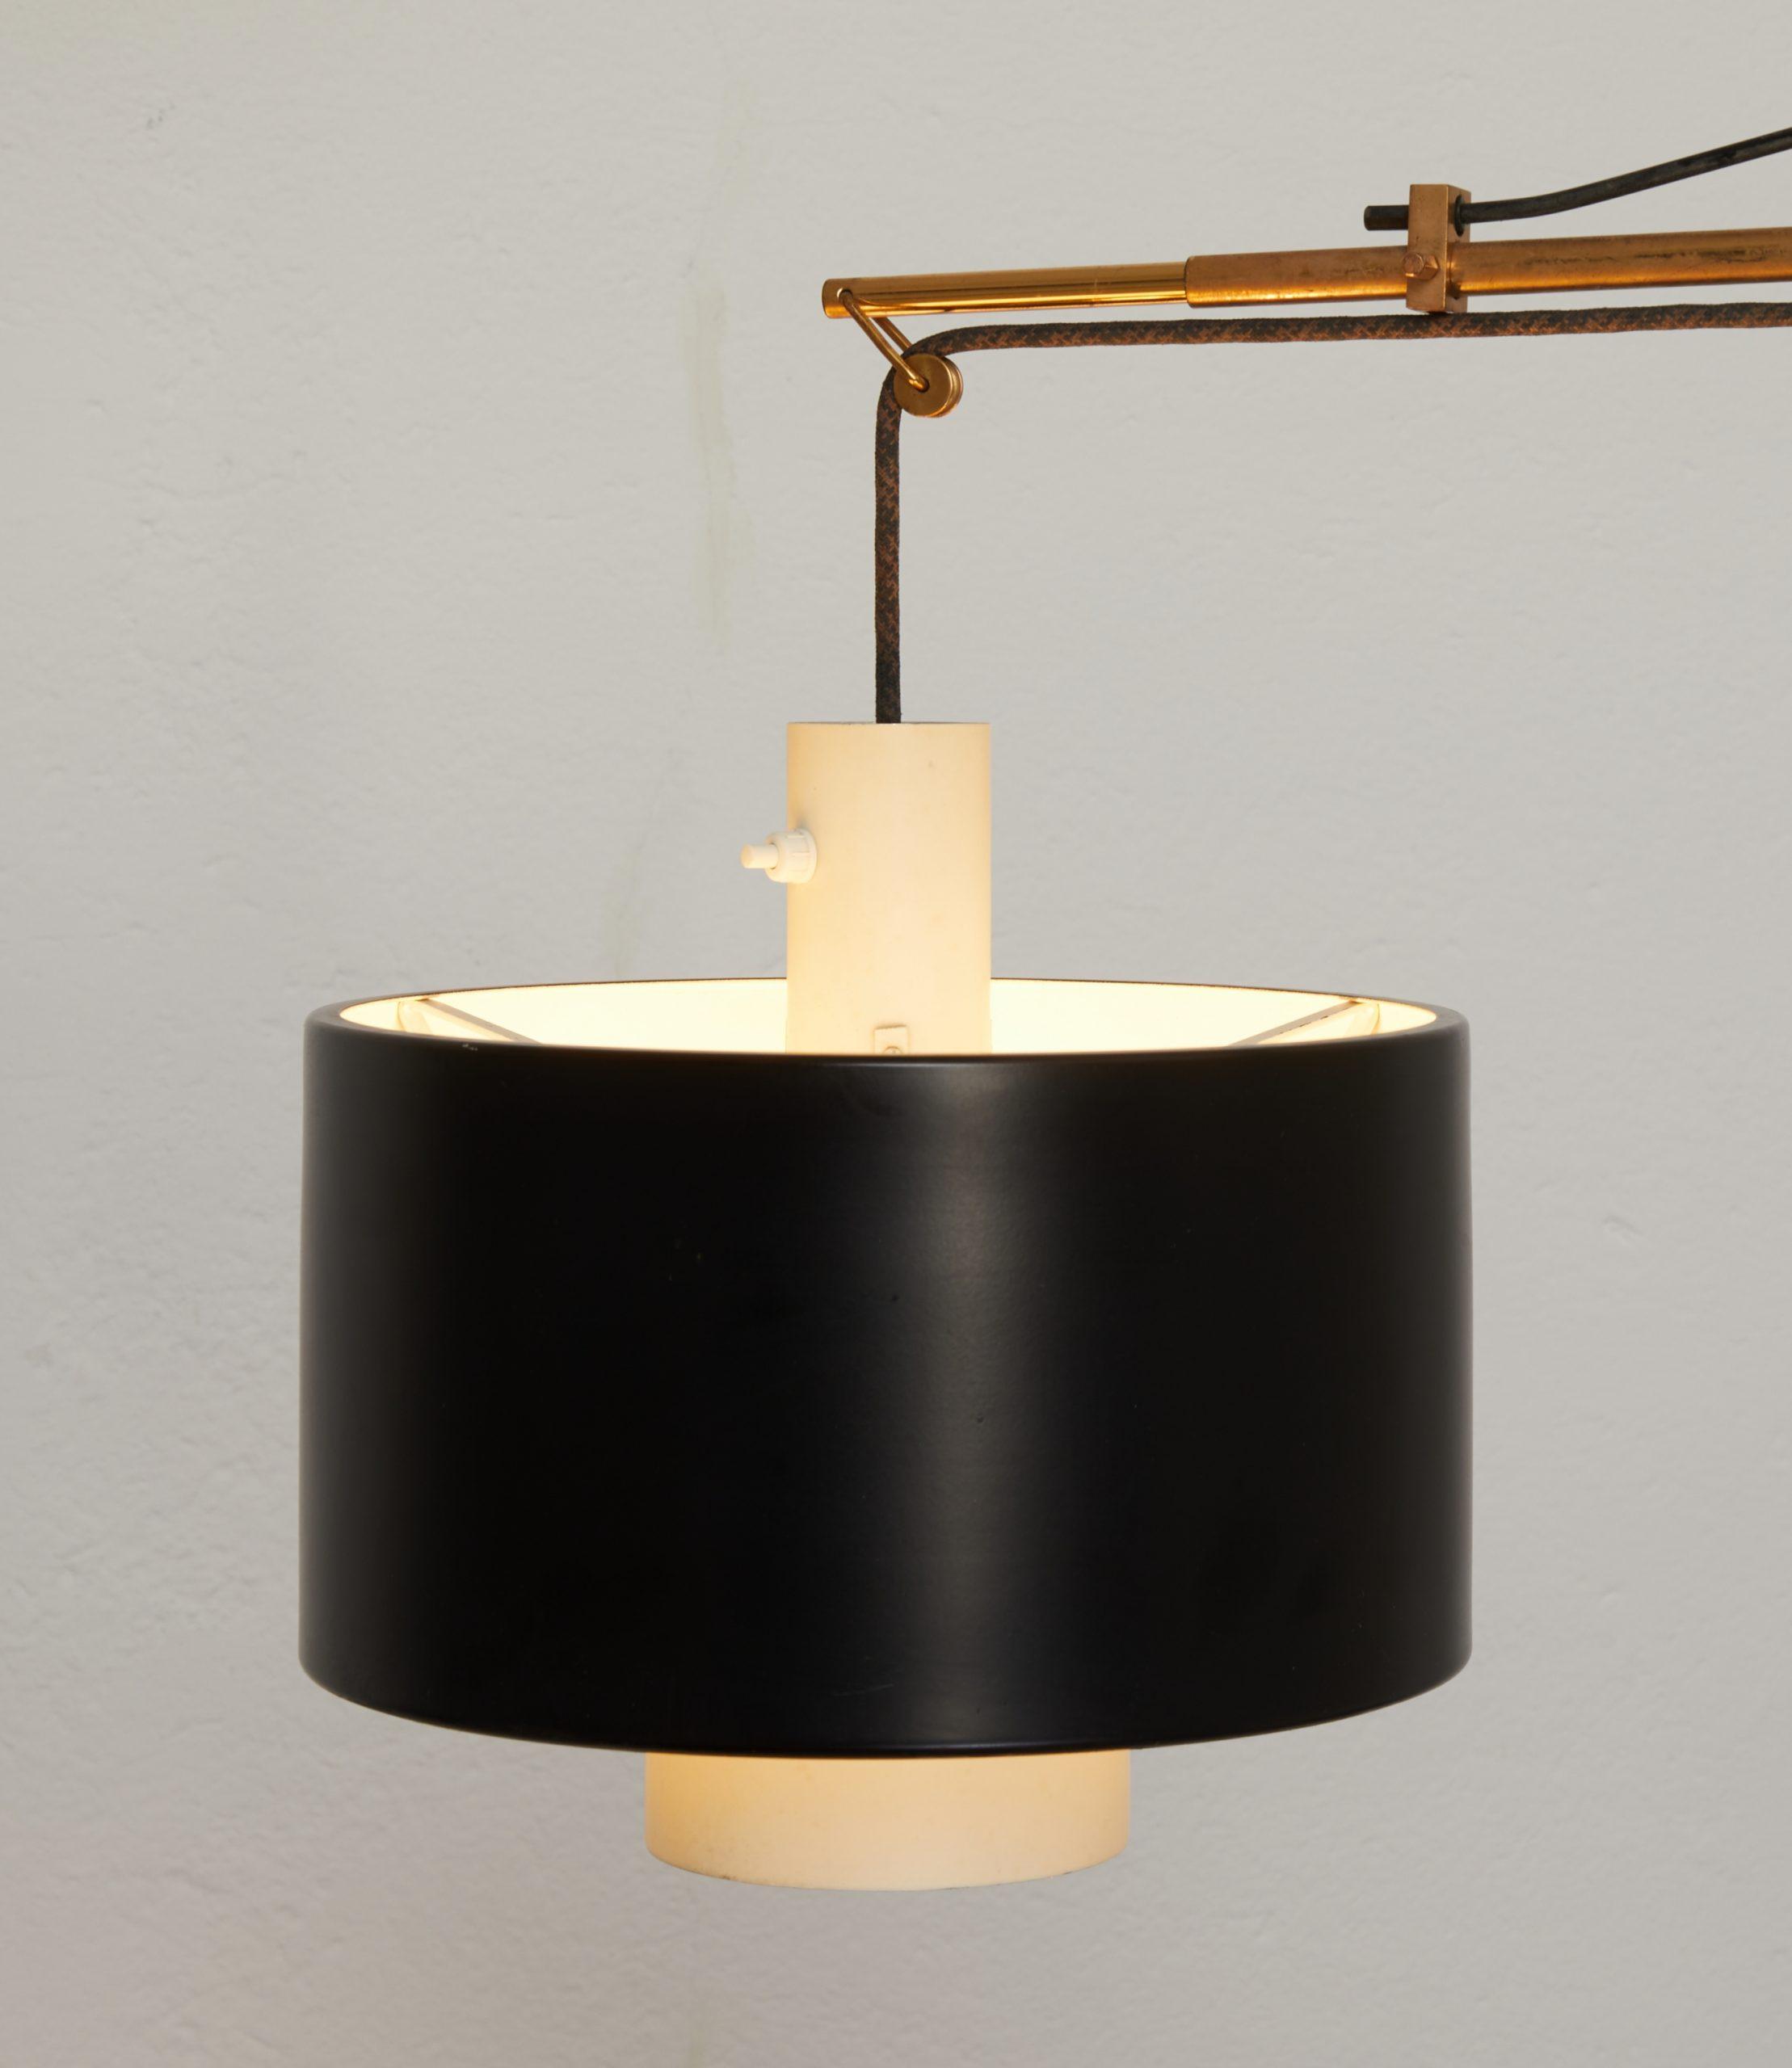 brass-wall-lamp-model-2061-by-gaetano-scolari-for-stilnovo-1954-image-05